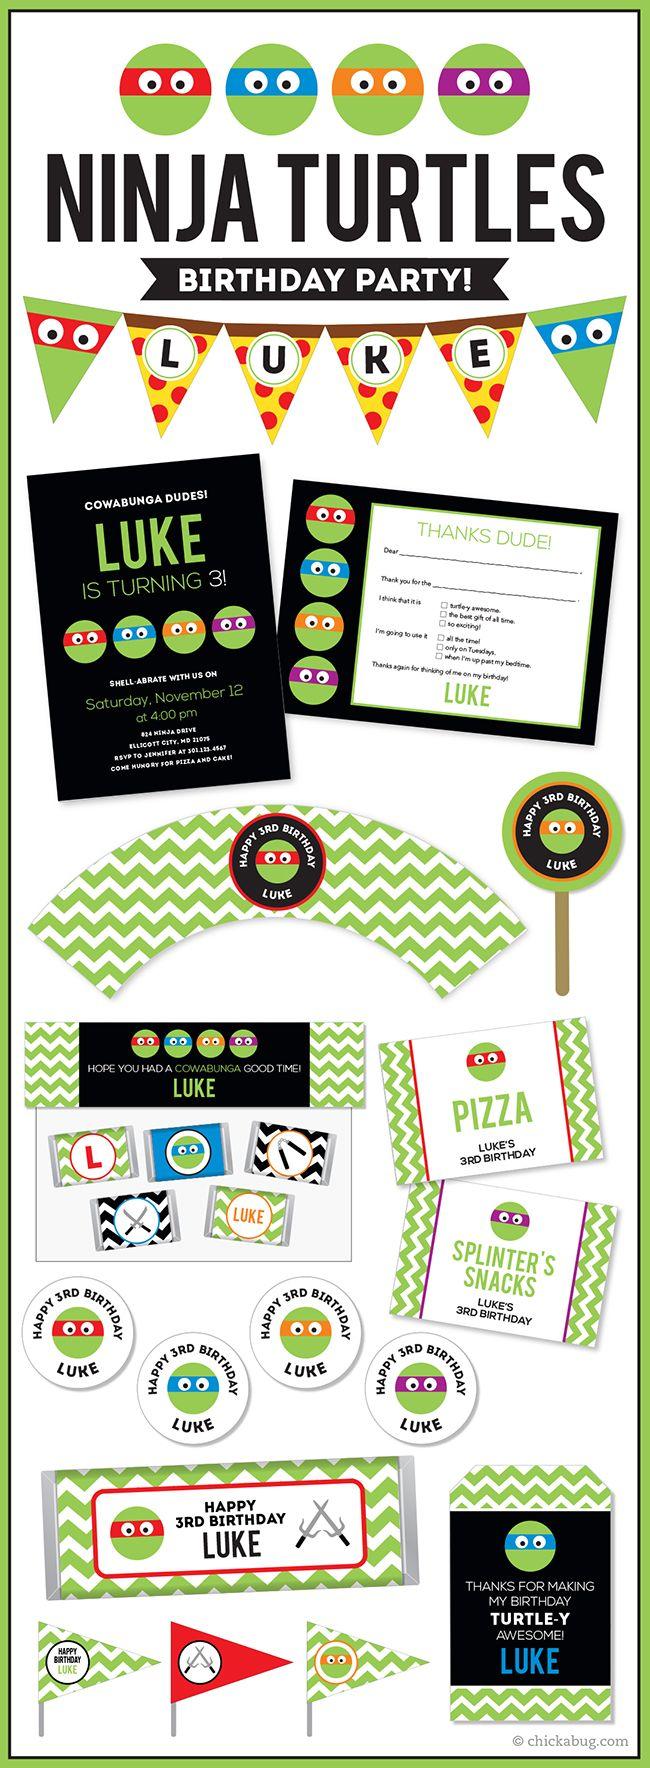 Gmail ninja theme - Teenage Mutant Ninja Turtles Theme Party Invitations Water Labels Stickers Diy Party